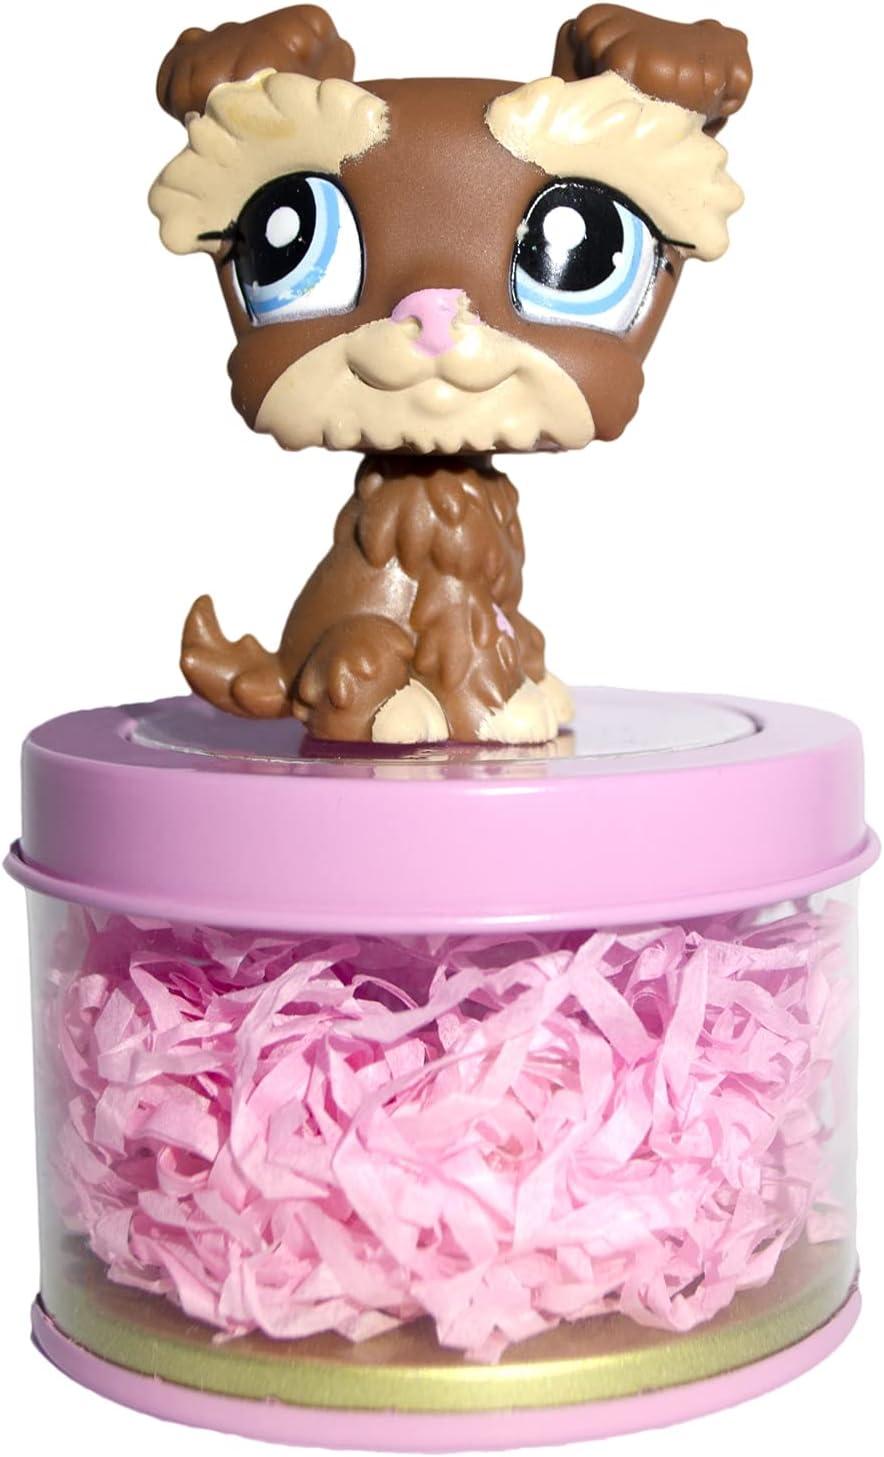 Mini pet Ranking TOP9 Shop lps Excellence Cats Dogs Cute Packs Kitten My Cartoon